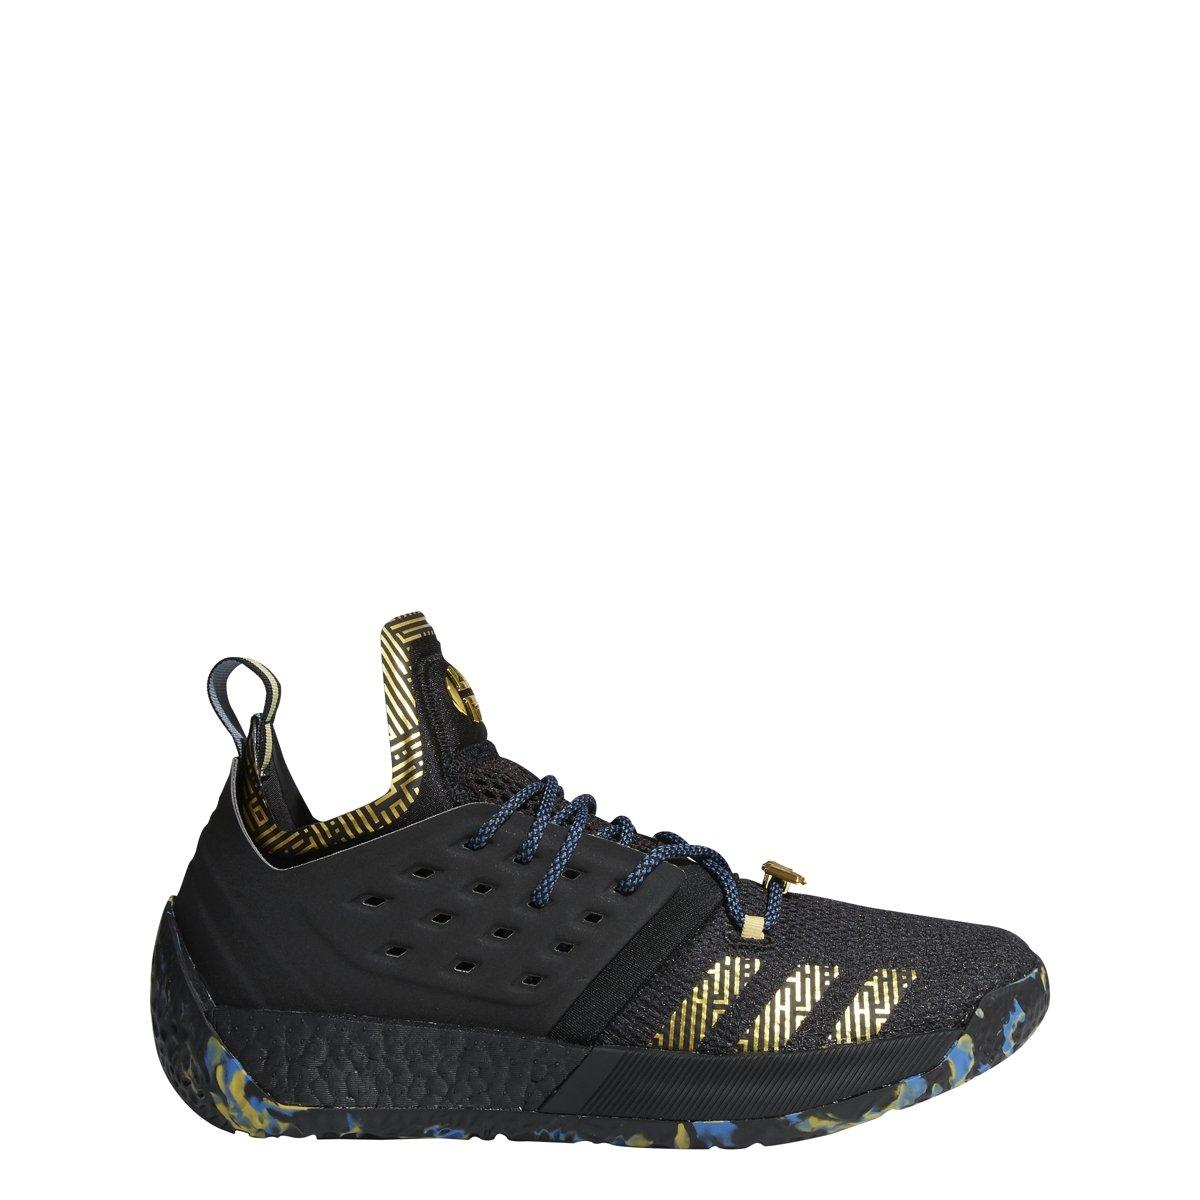 adidas Harden Vol. 2 MVP Men's Basketball Shoes B07F2THDLF 12 D(M) US Core Black-gold Metallic-royal